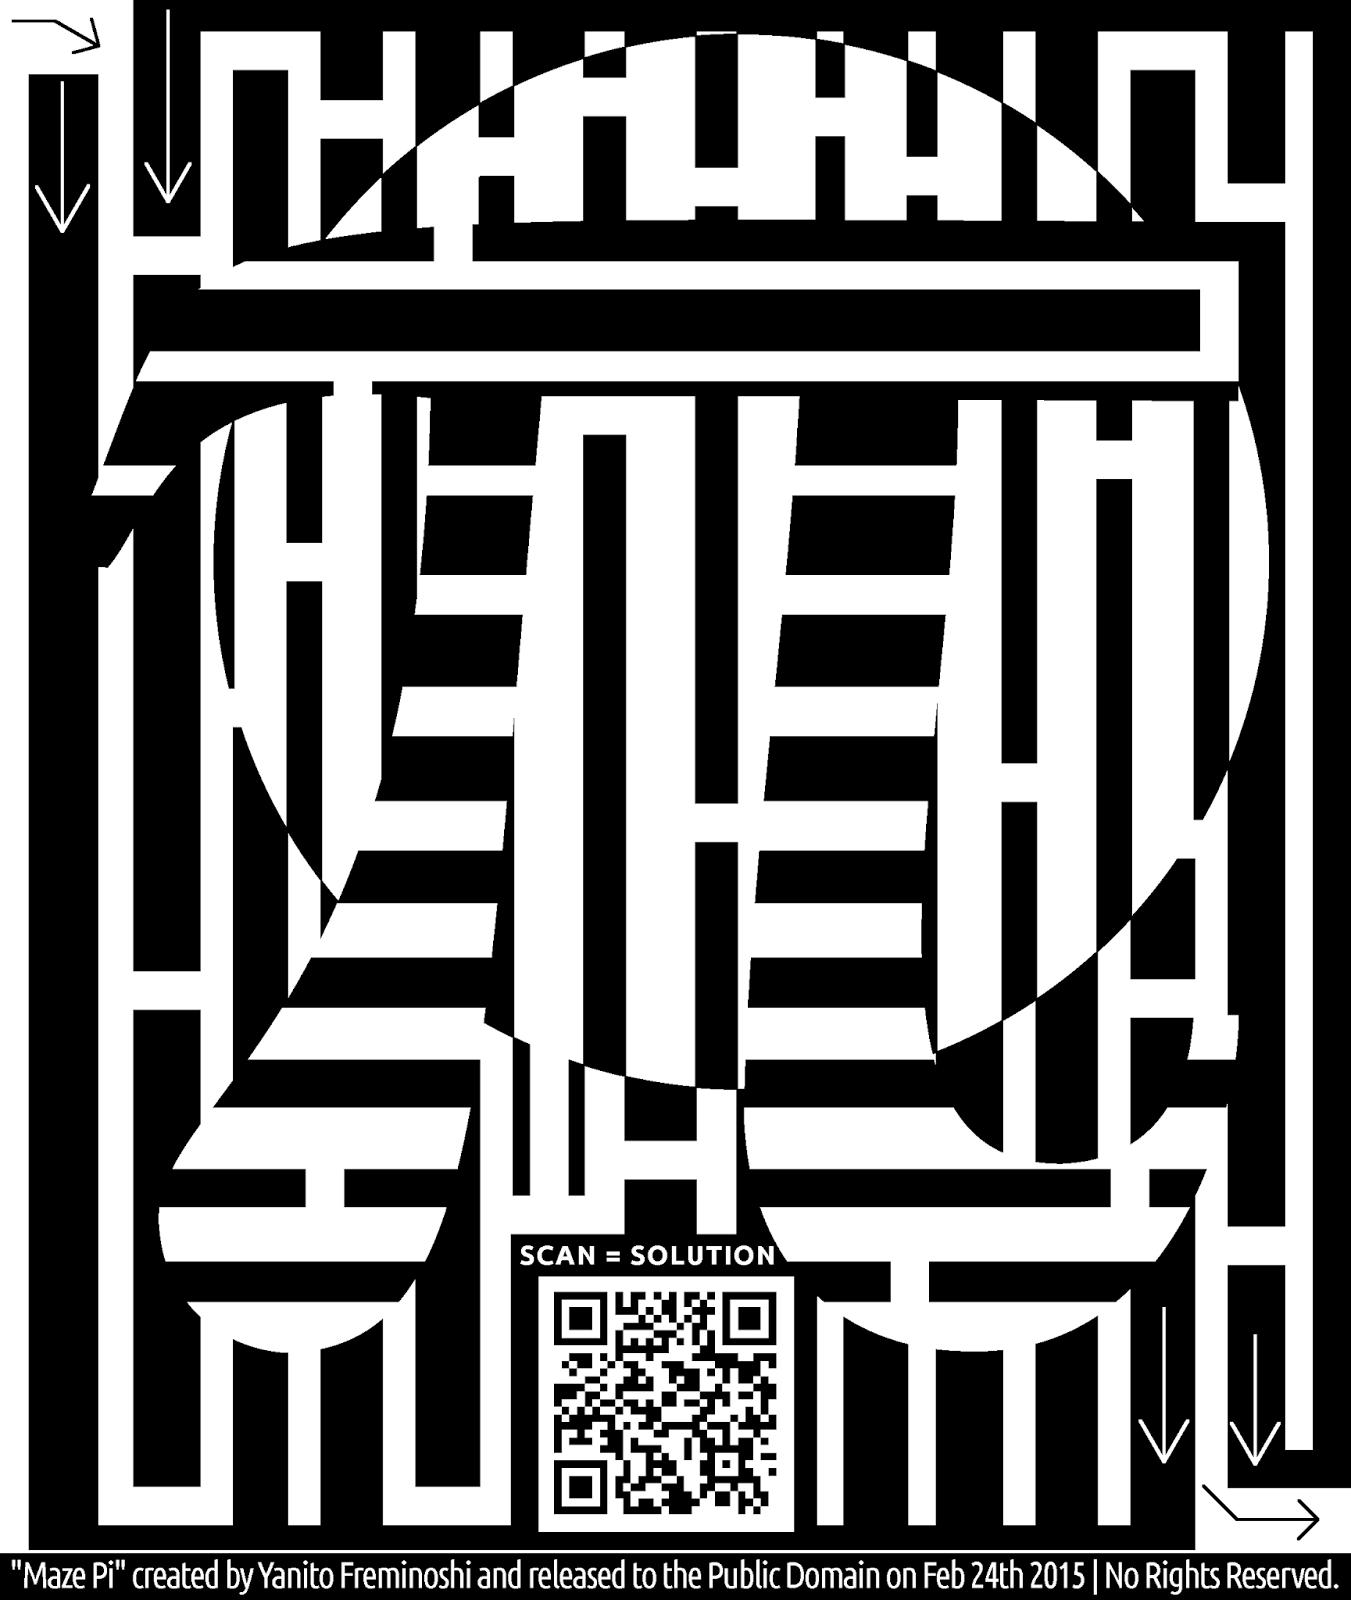 Yanito Freminoshi Maze Like Samurai Maze Of The Pi Symbol